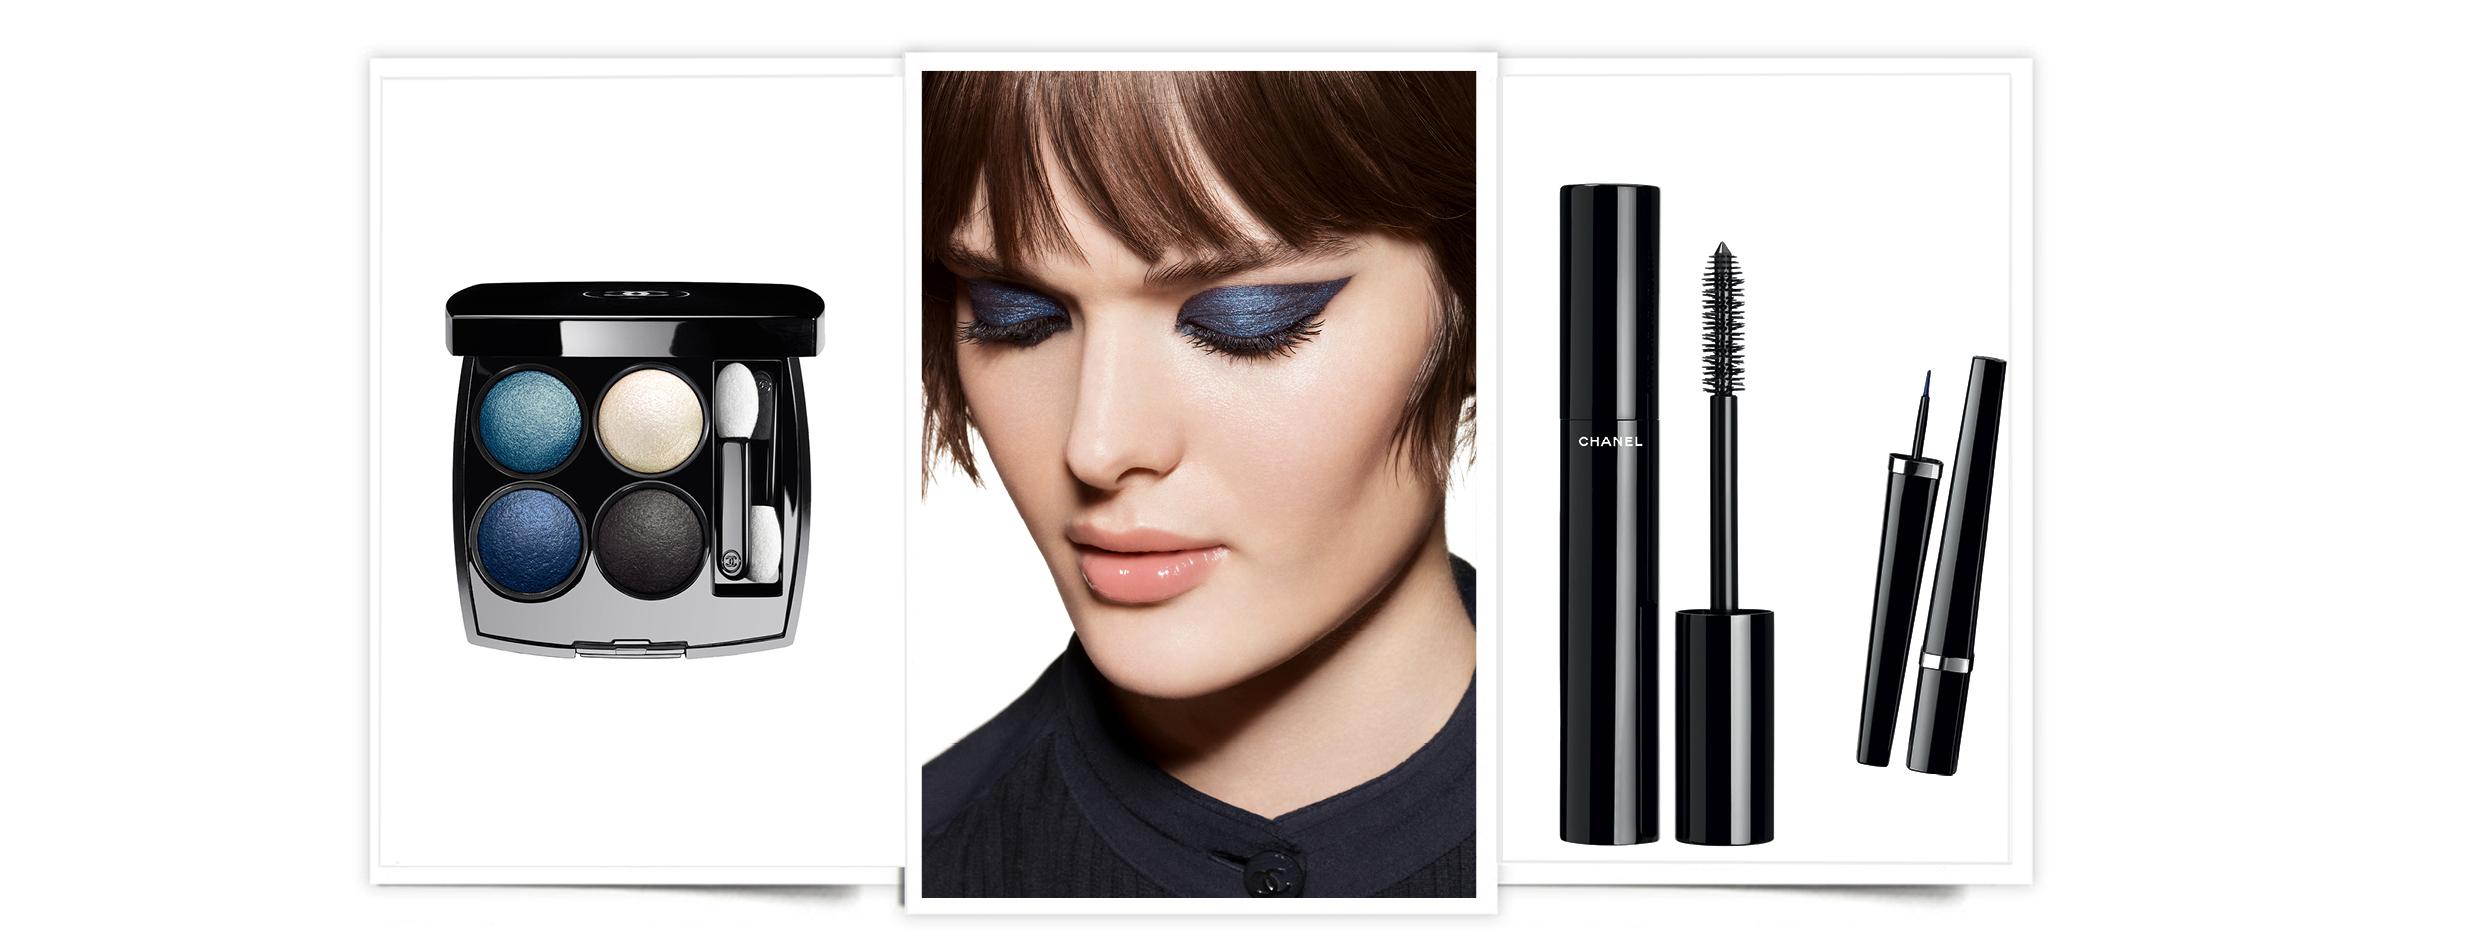 Colección Blue Rhythm, Chanel